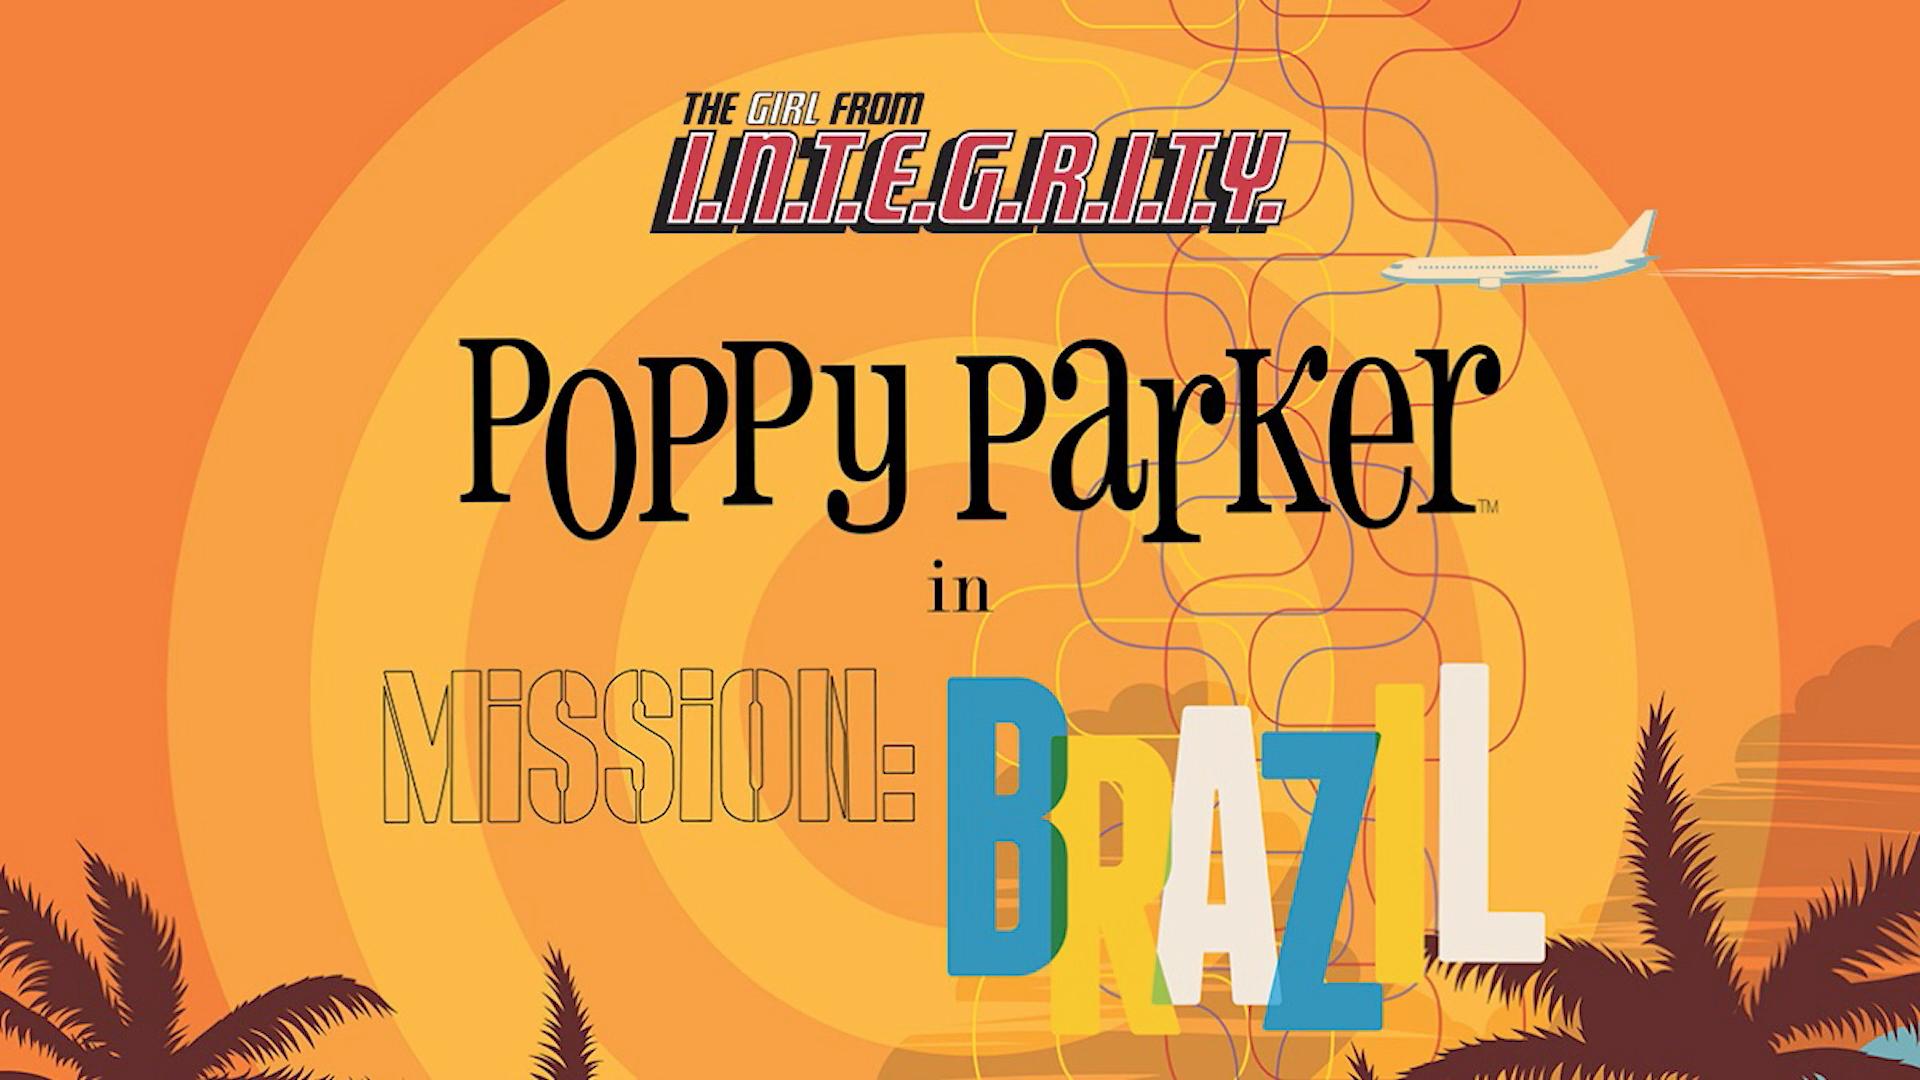 POPPY PARKER IN MISSION: BRAZIL - PREORDER NOW!